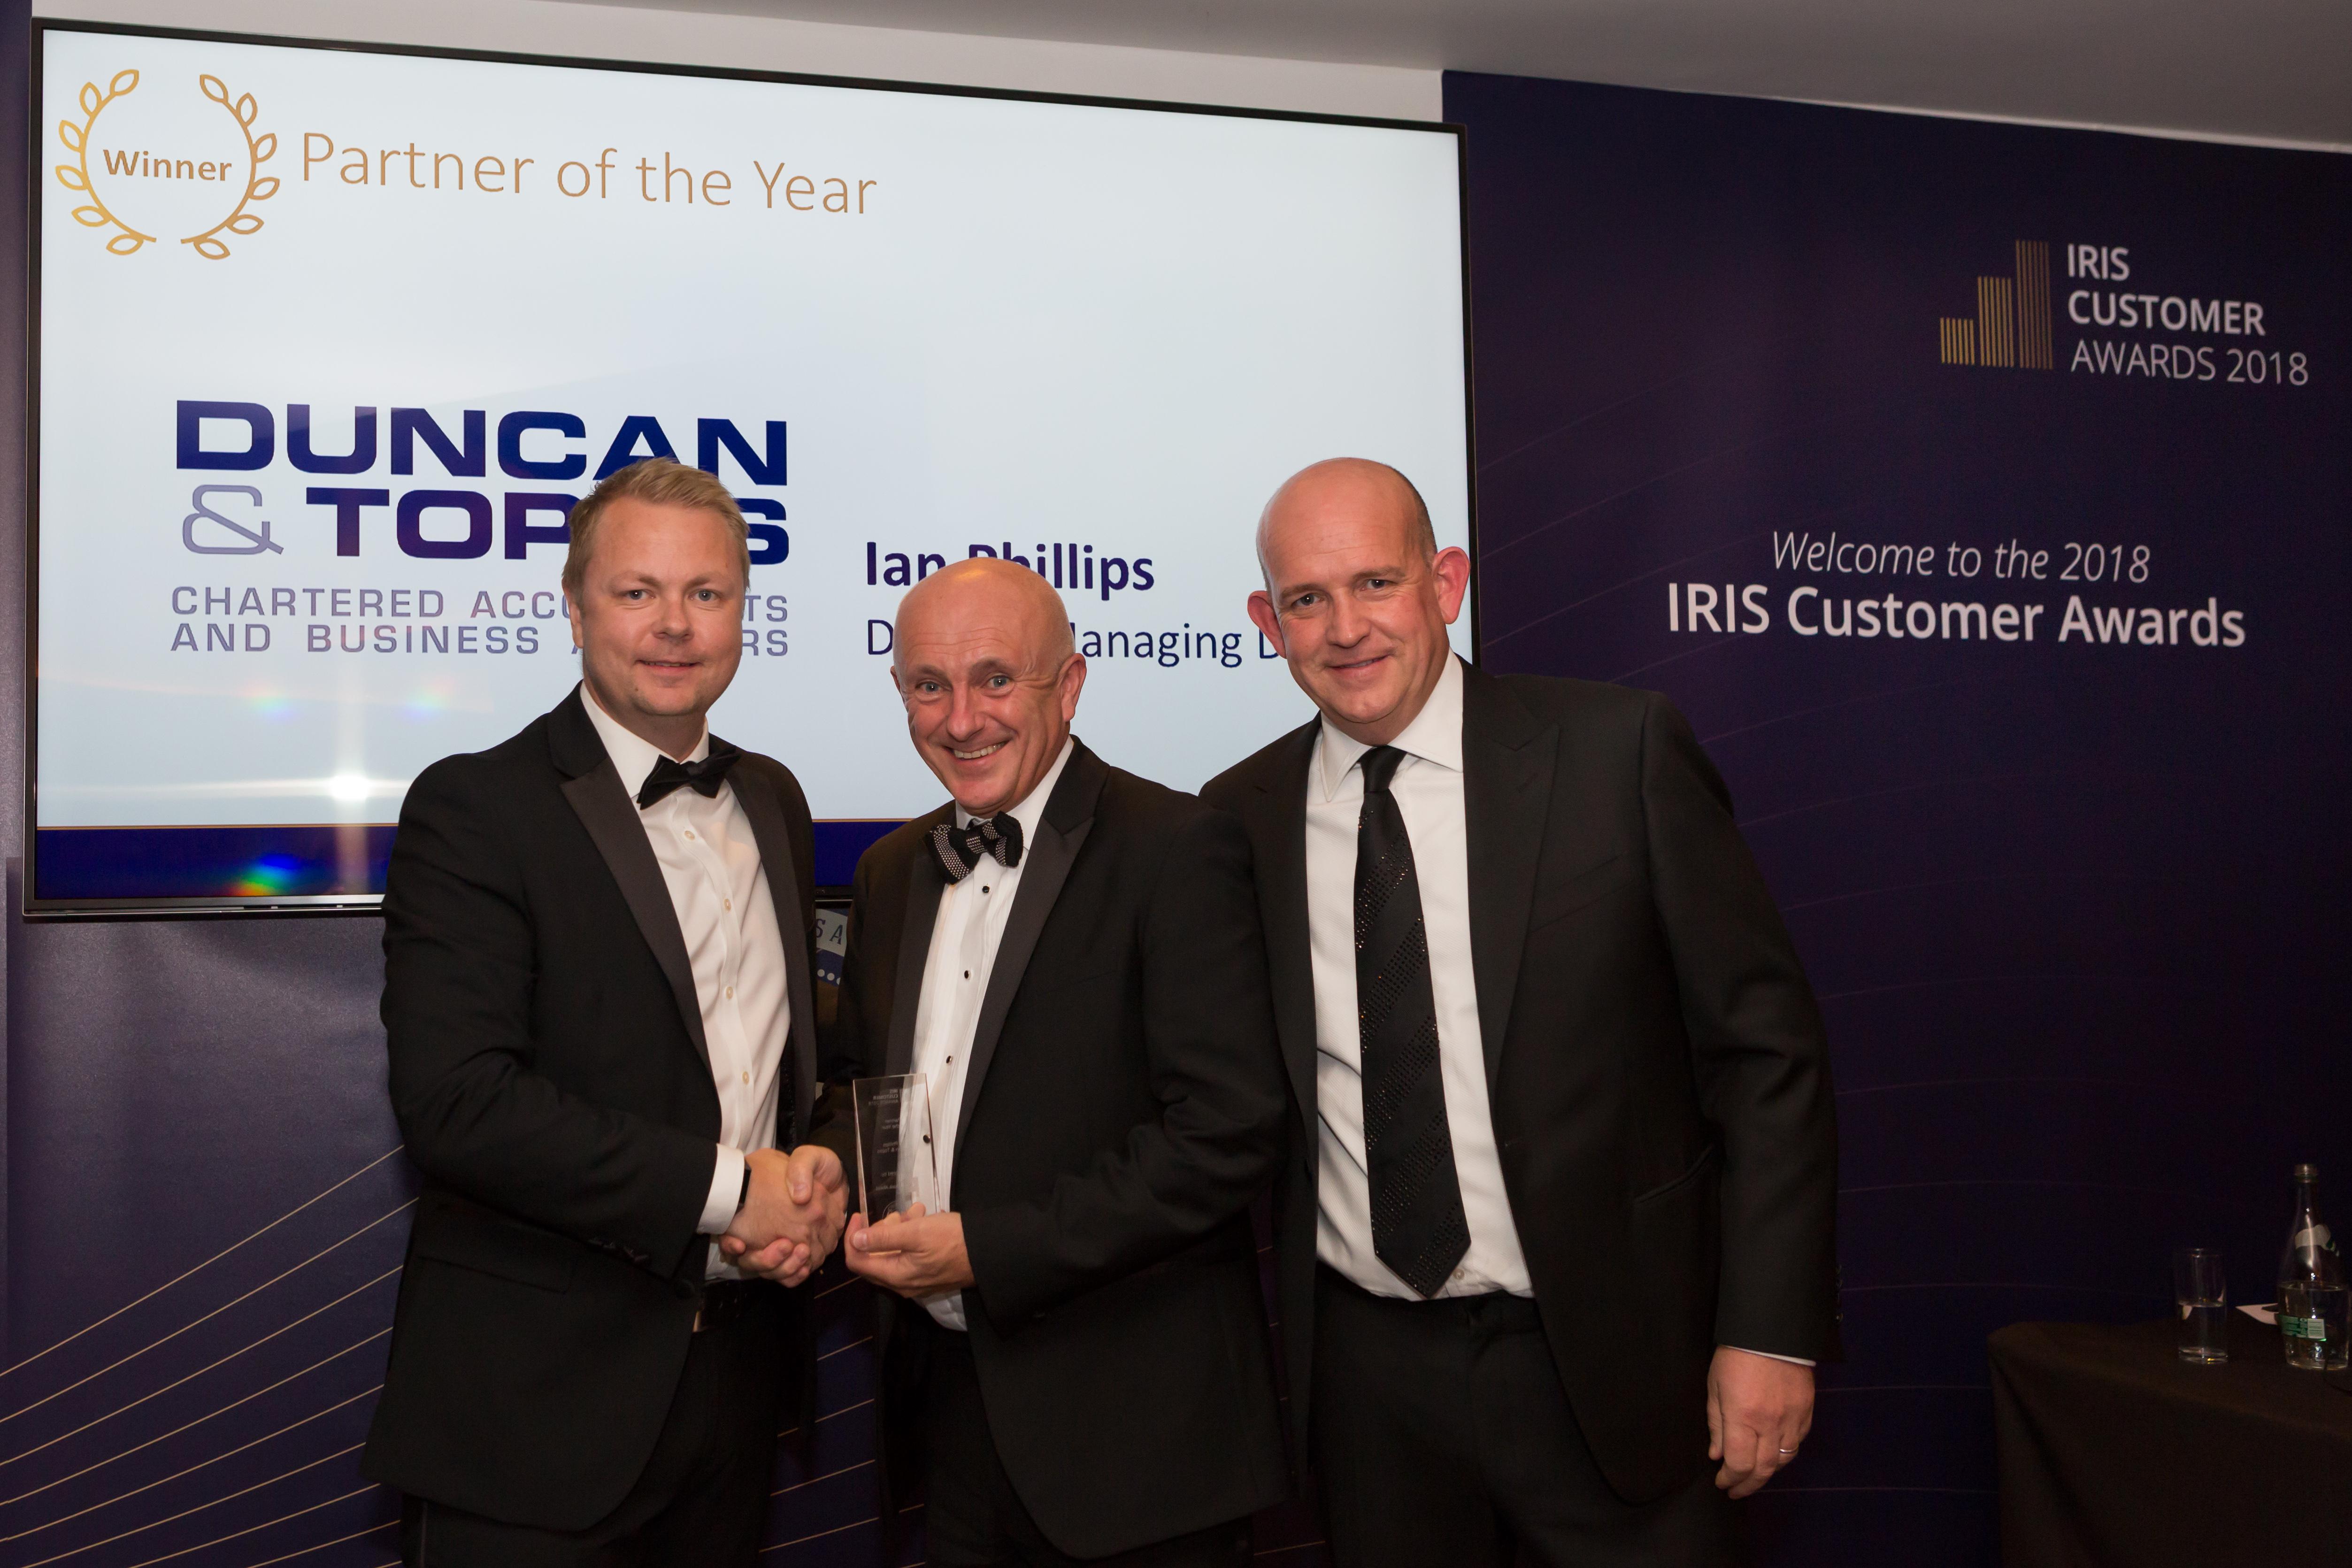 Duncan & Toplis director named 'Partner of the Year'